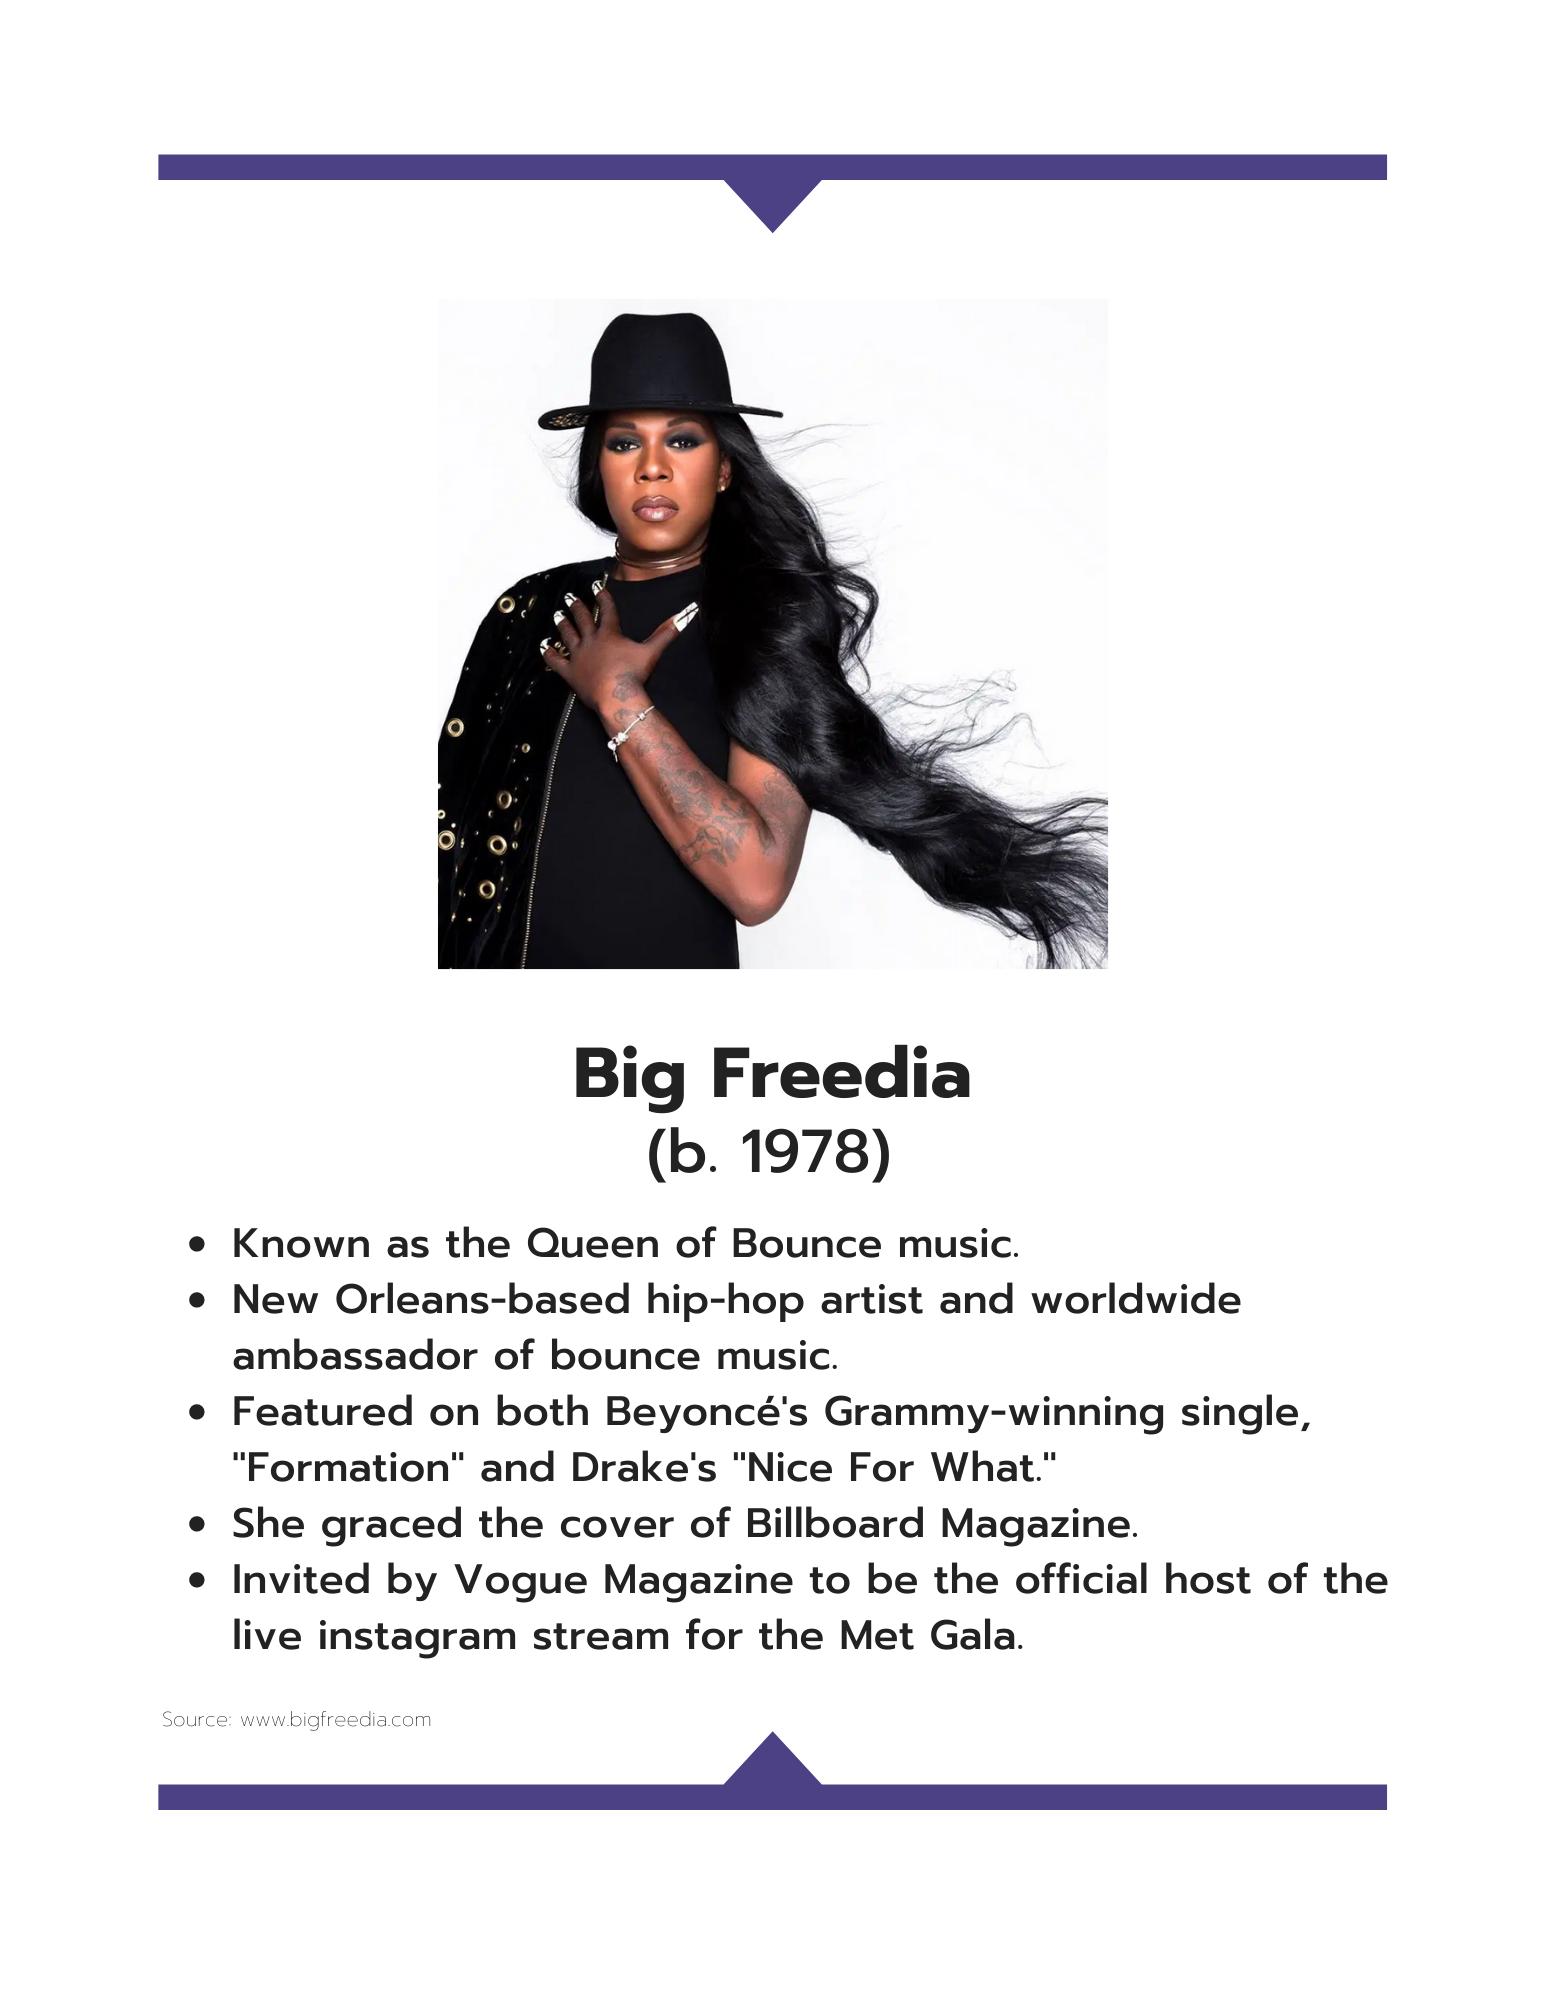 Big Freedia information sheet art